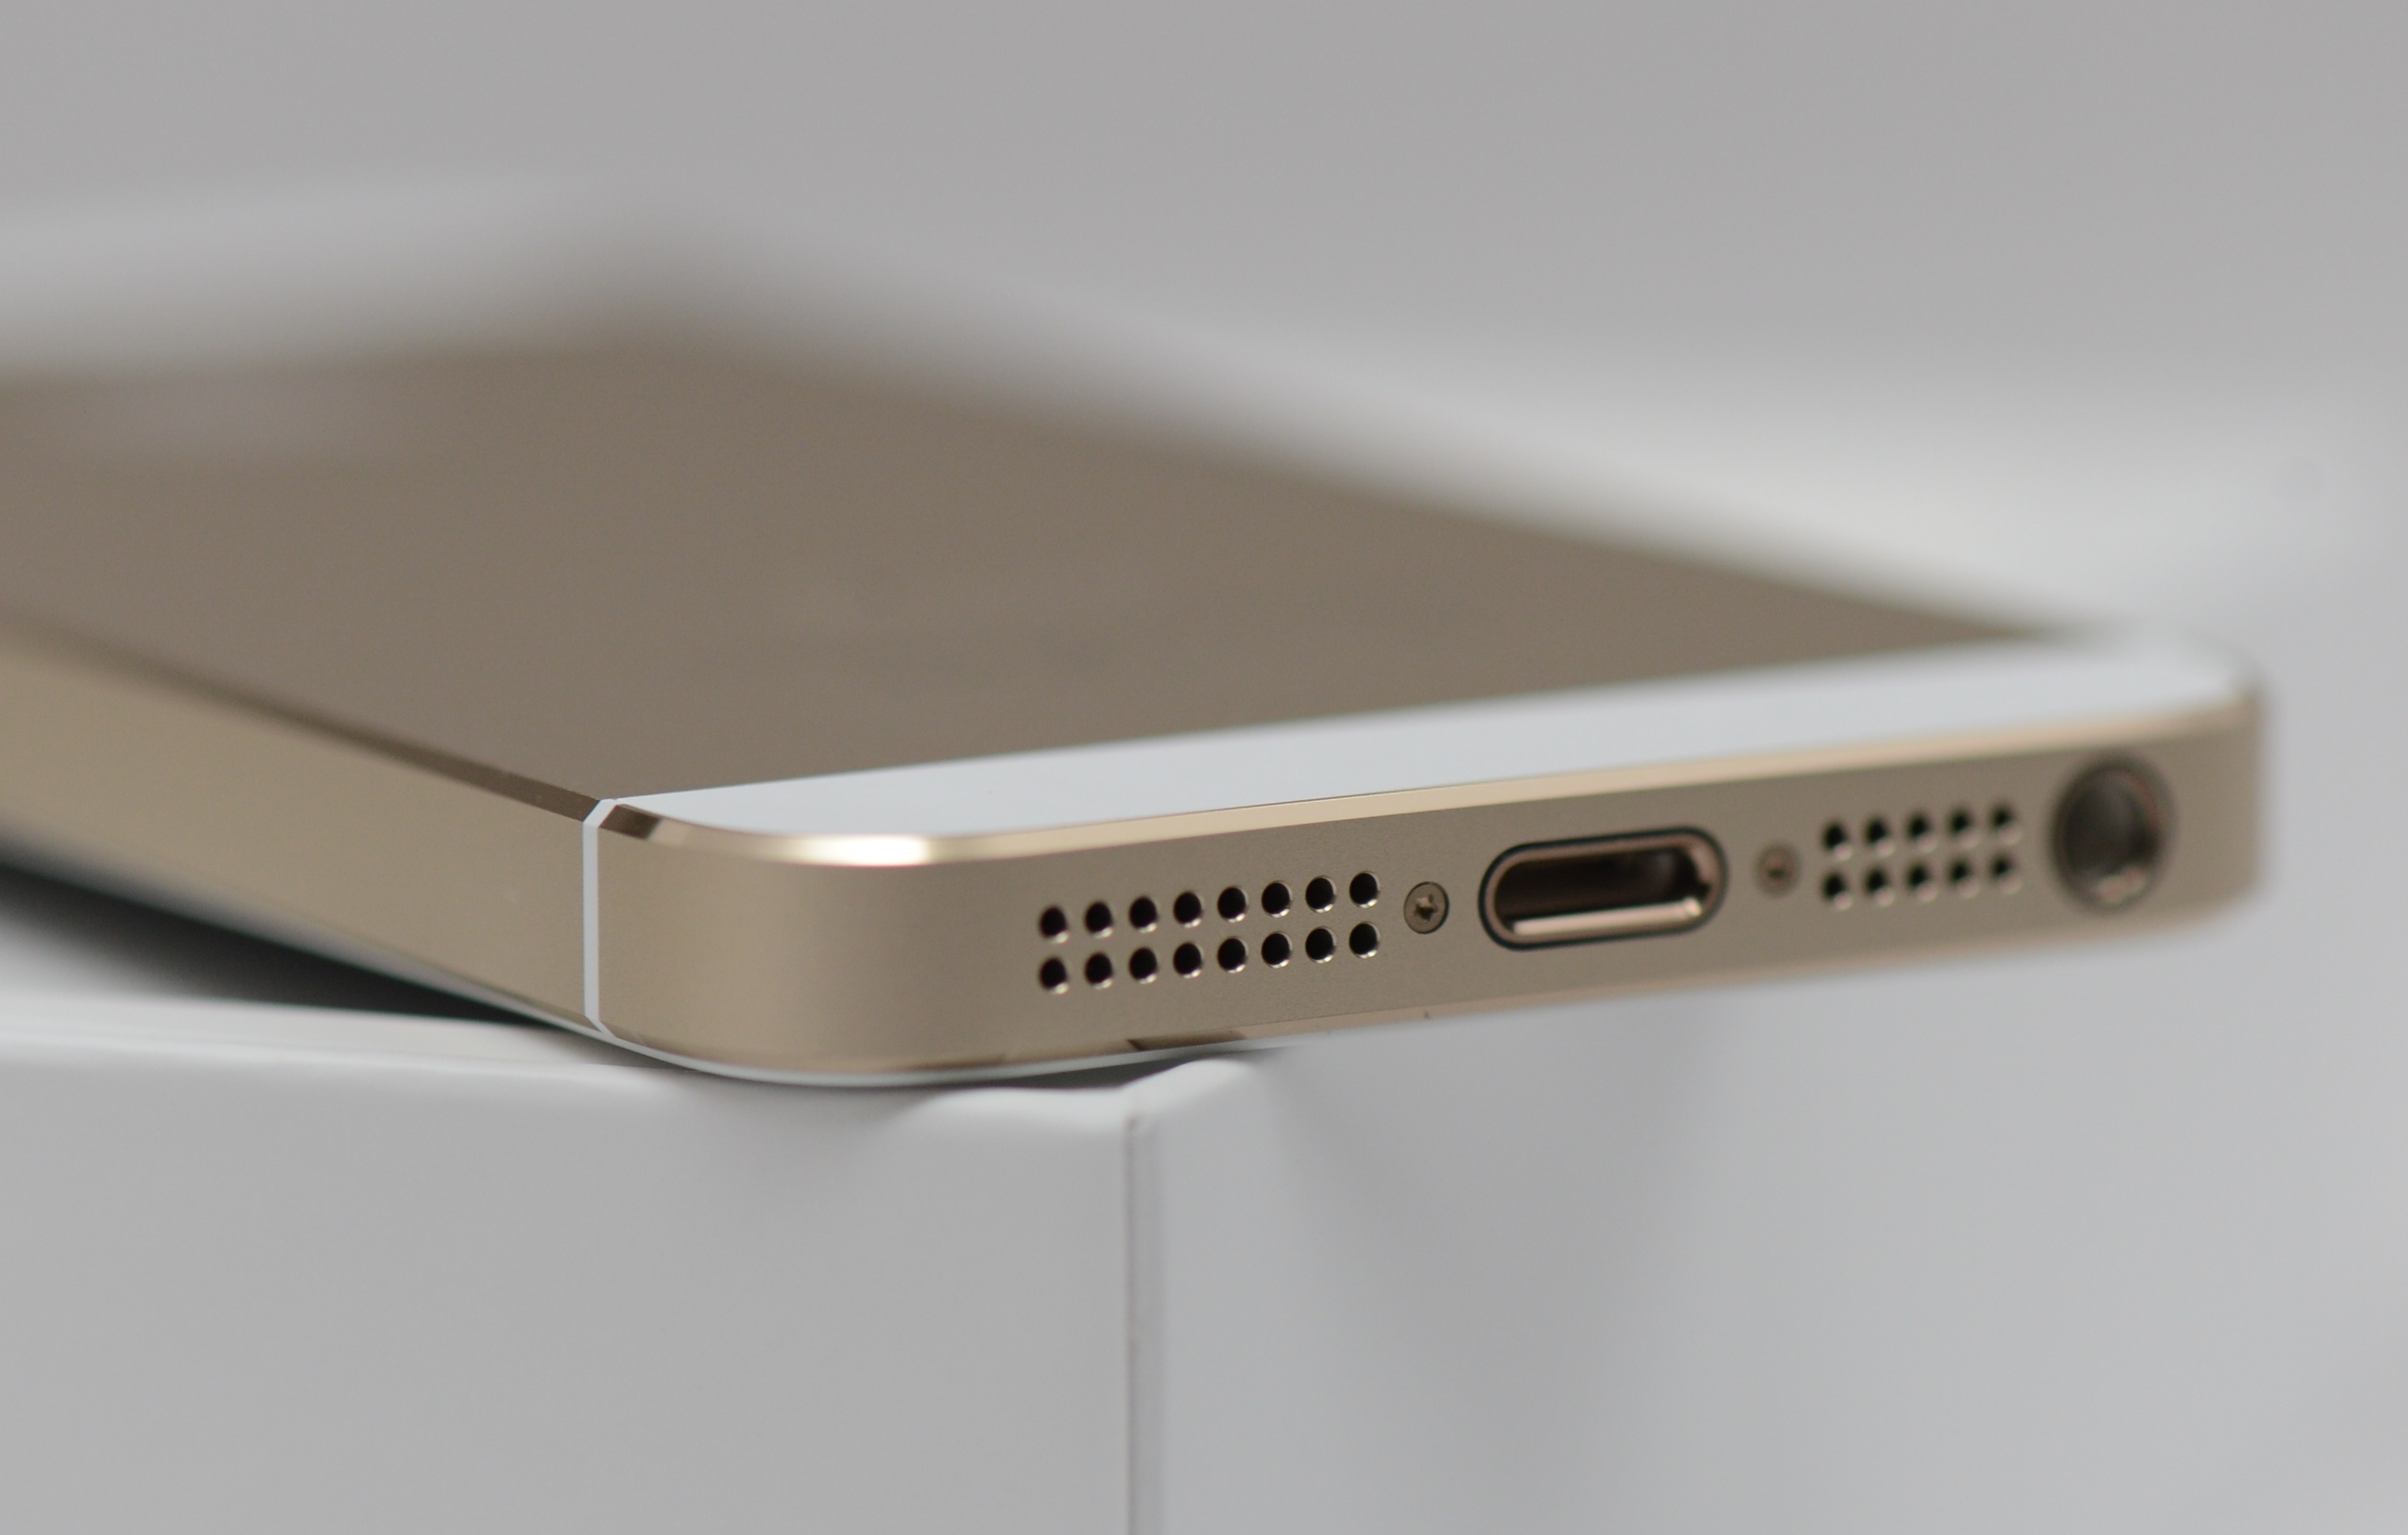 iphone-5s-recension 1